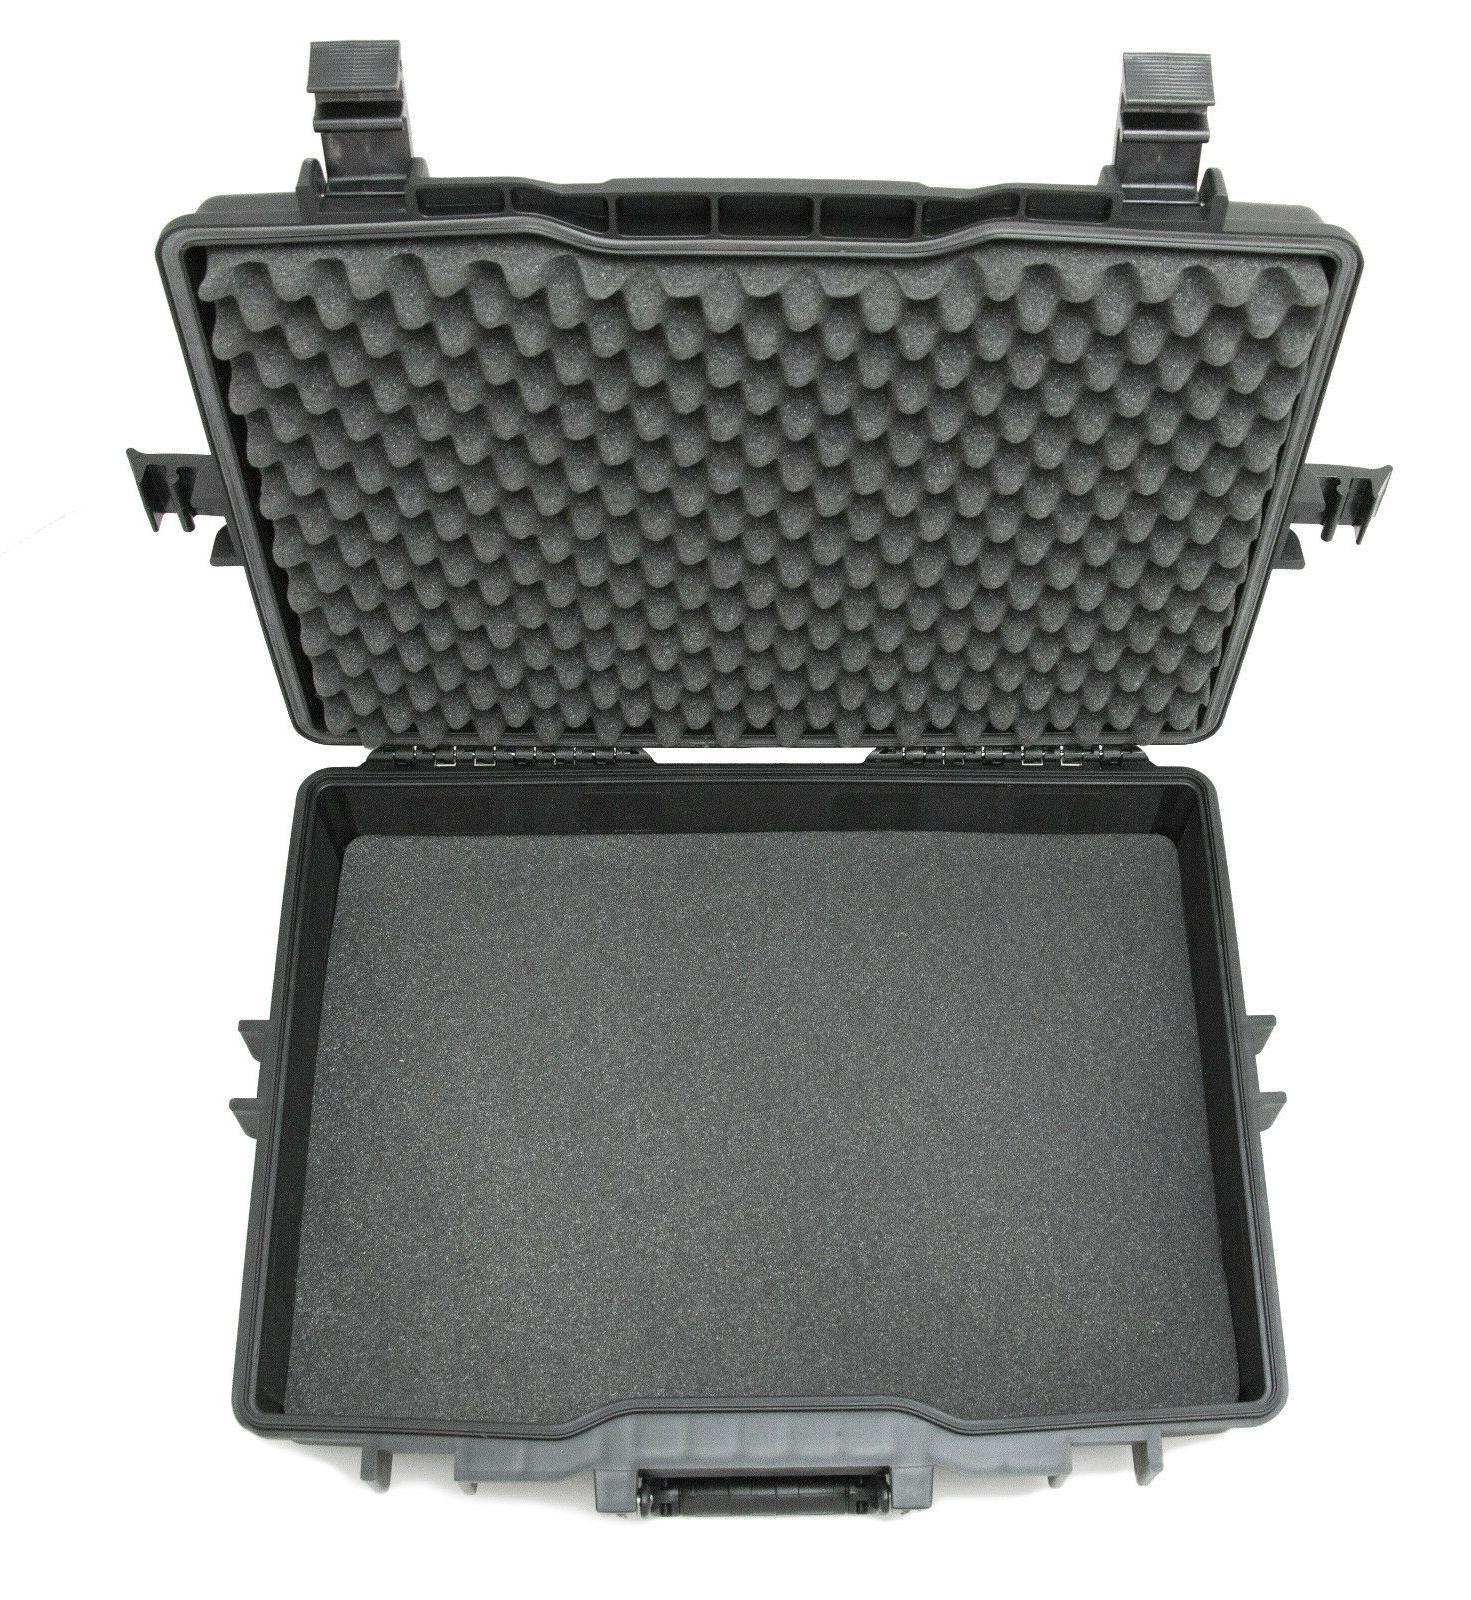 waterproof portable monitor case fits aoc usb